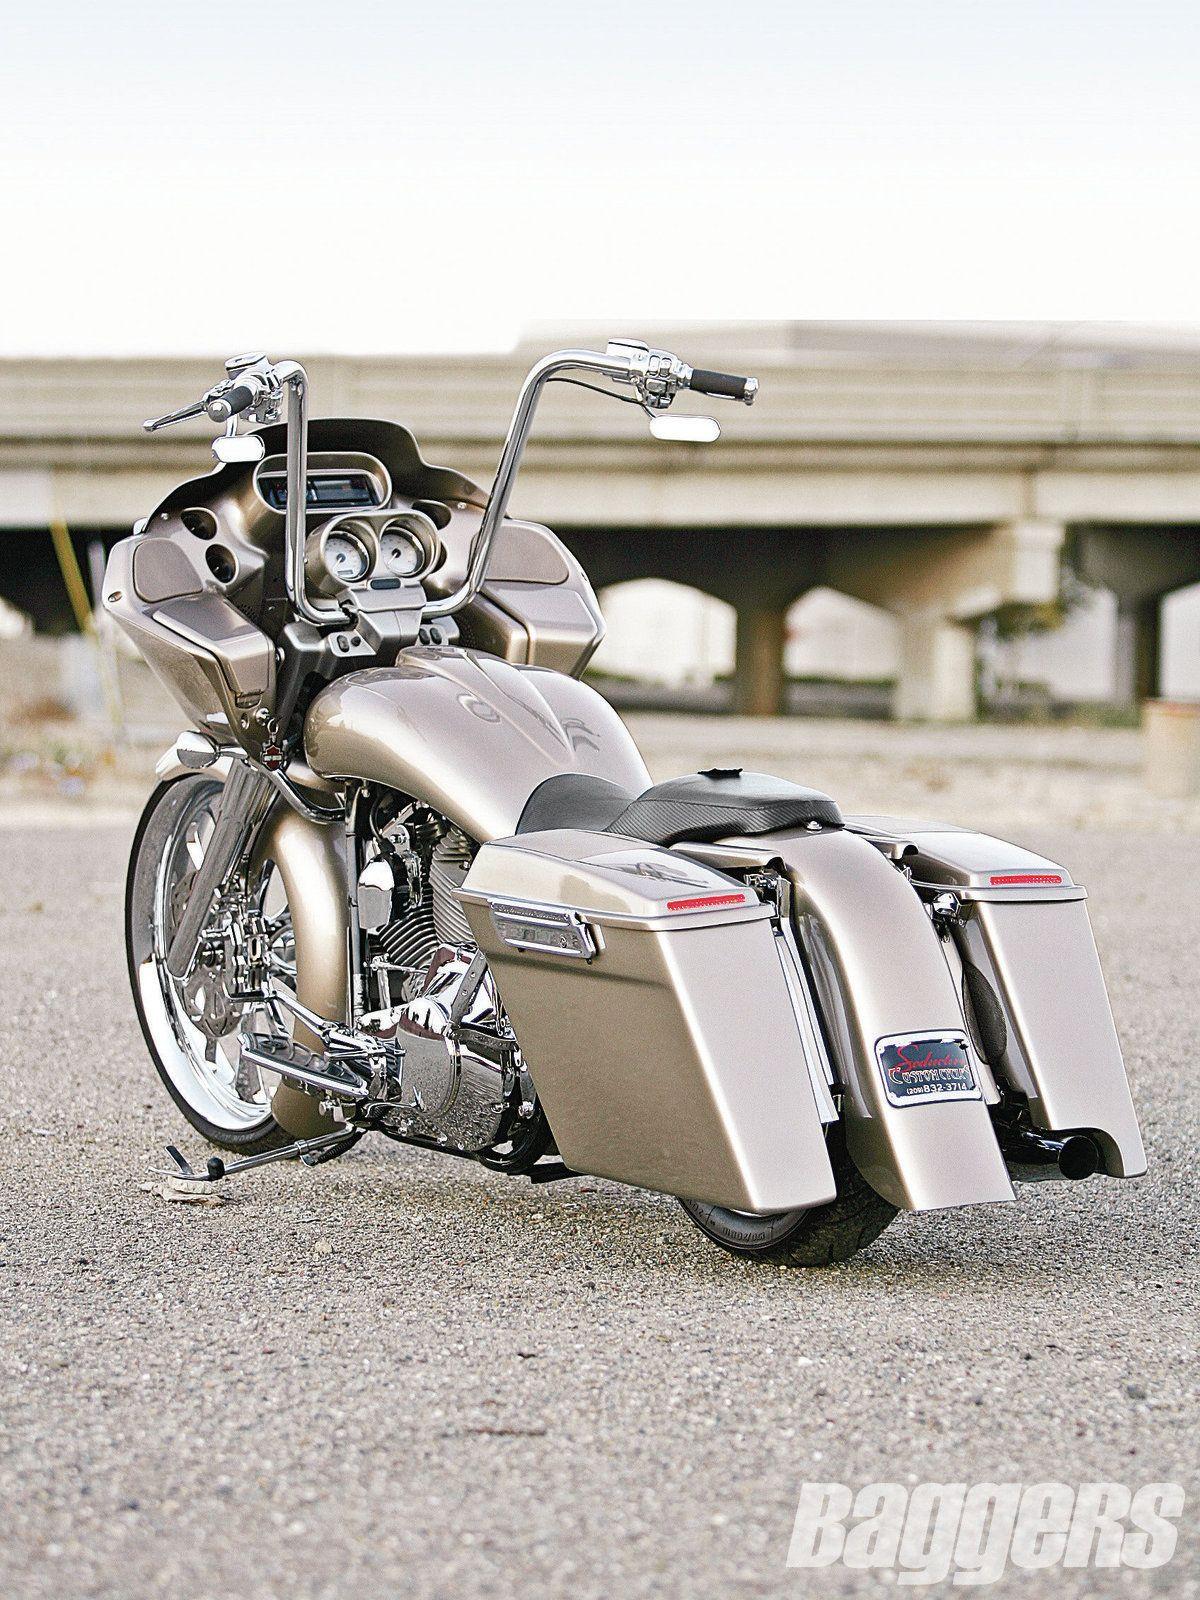 Rapid Transit 2006 Harley Davidson Flhr Harley Davidson Bikes Harley Bikes Harley Davidson